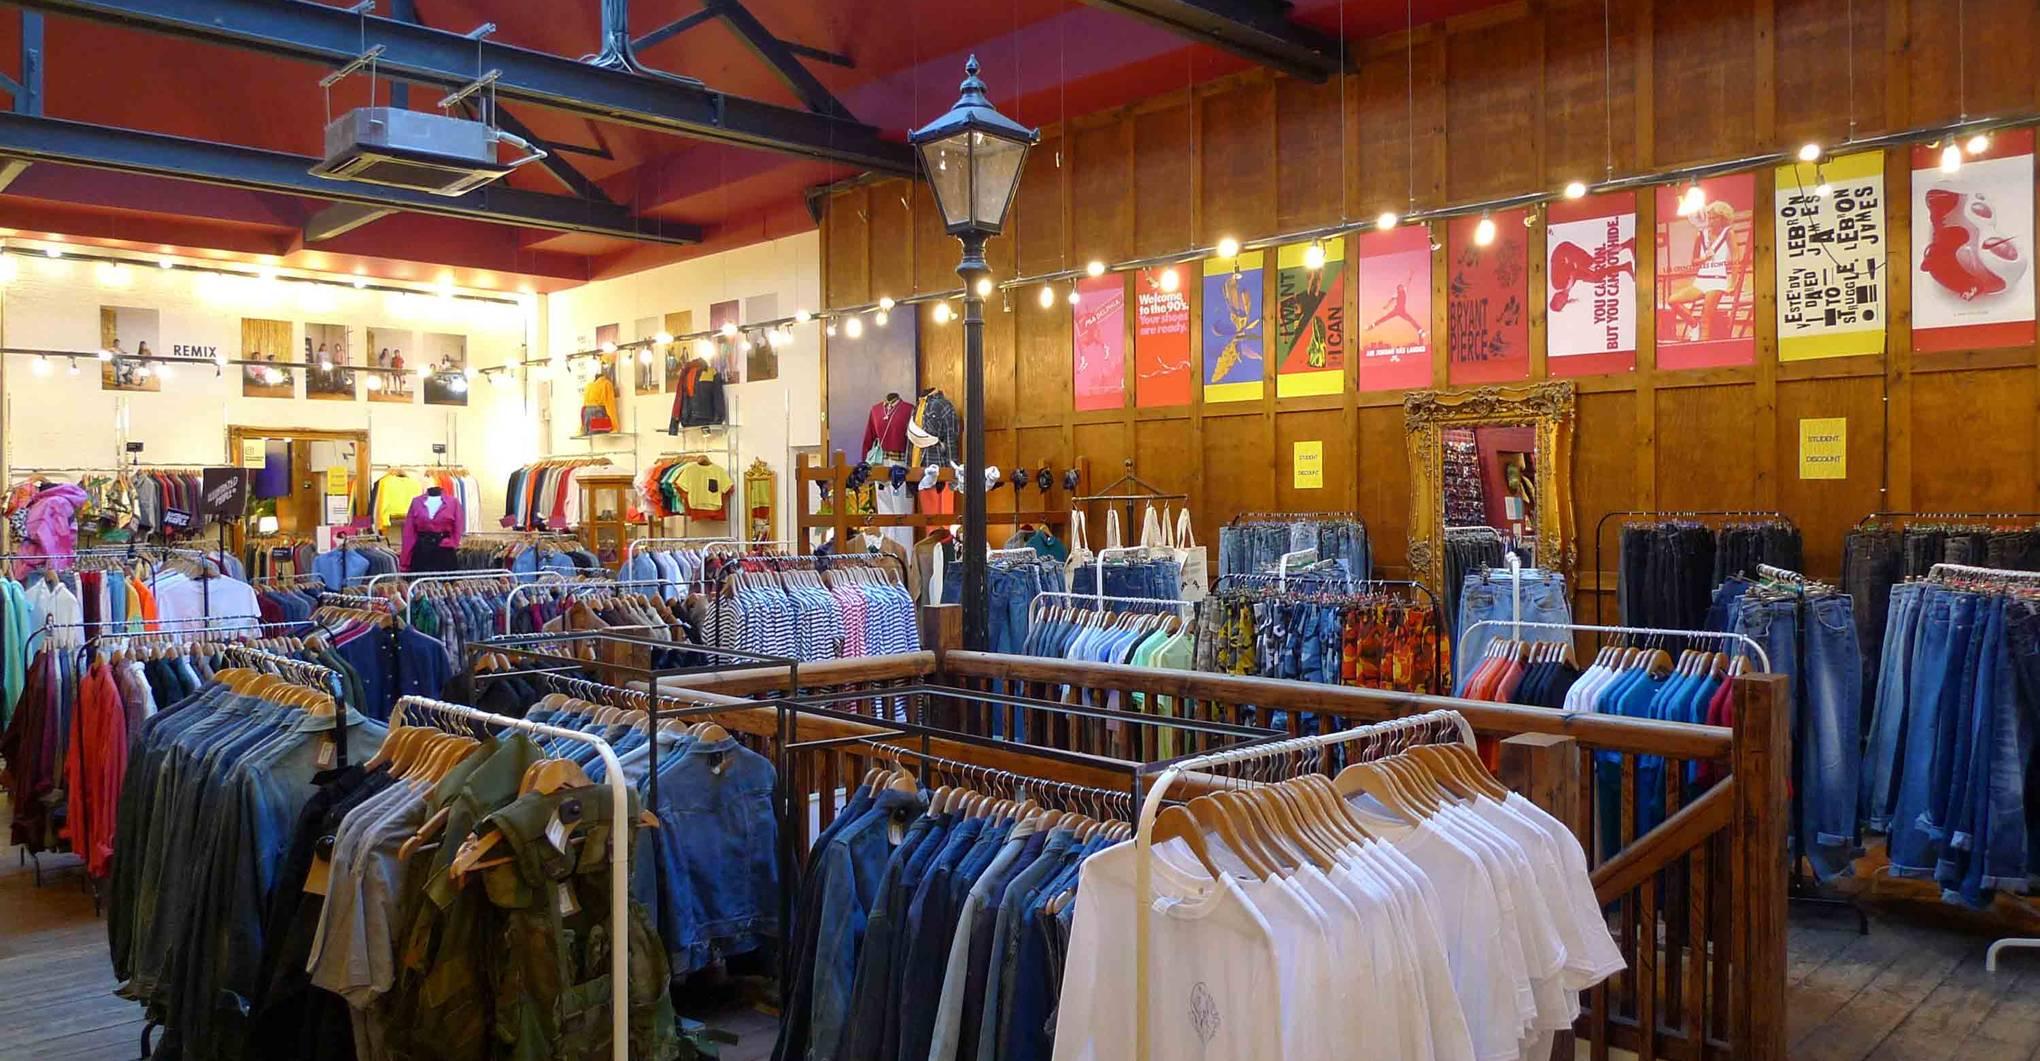 The 12 best vintage shops in London